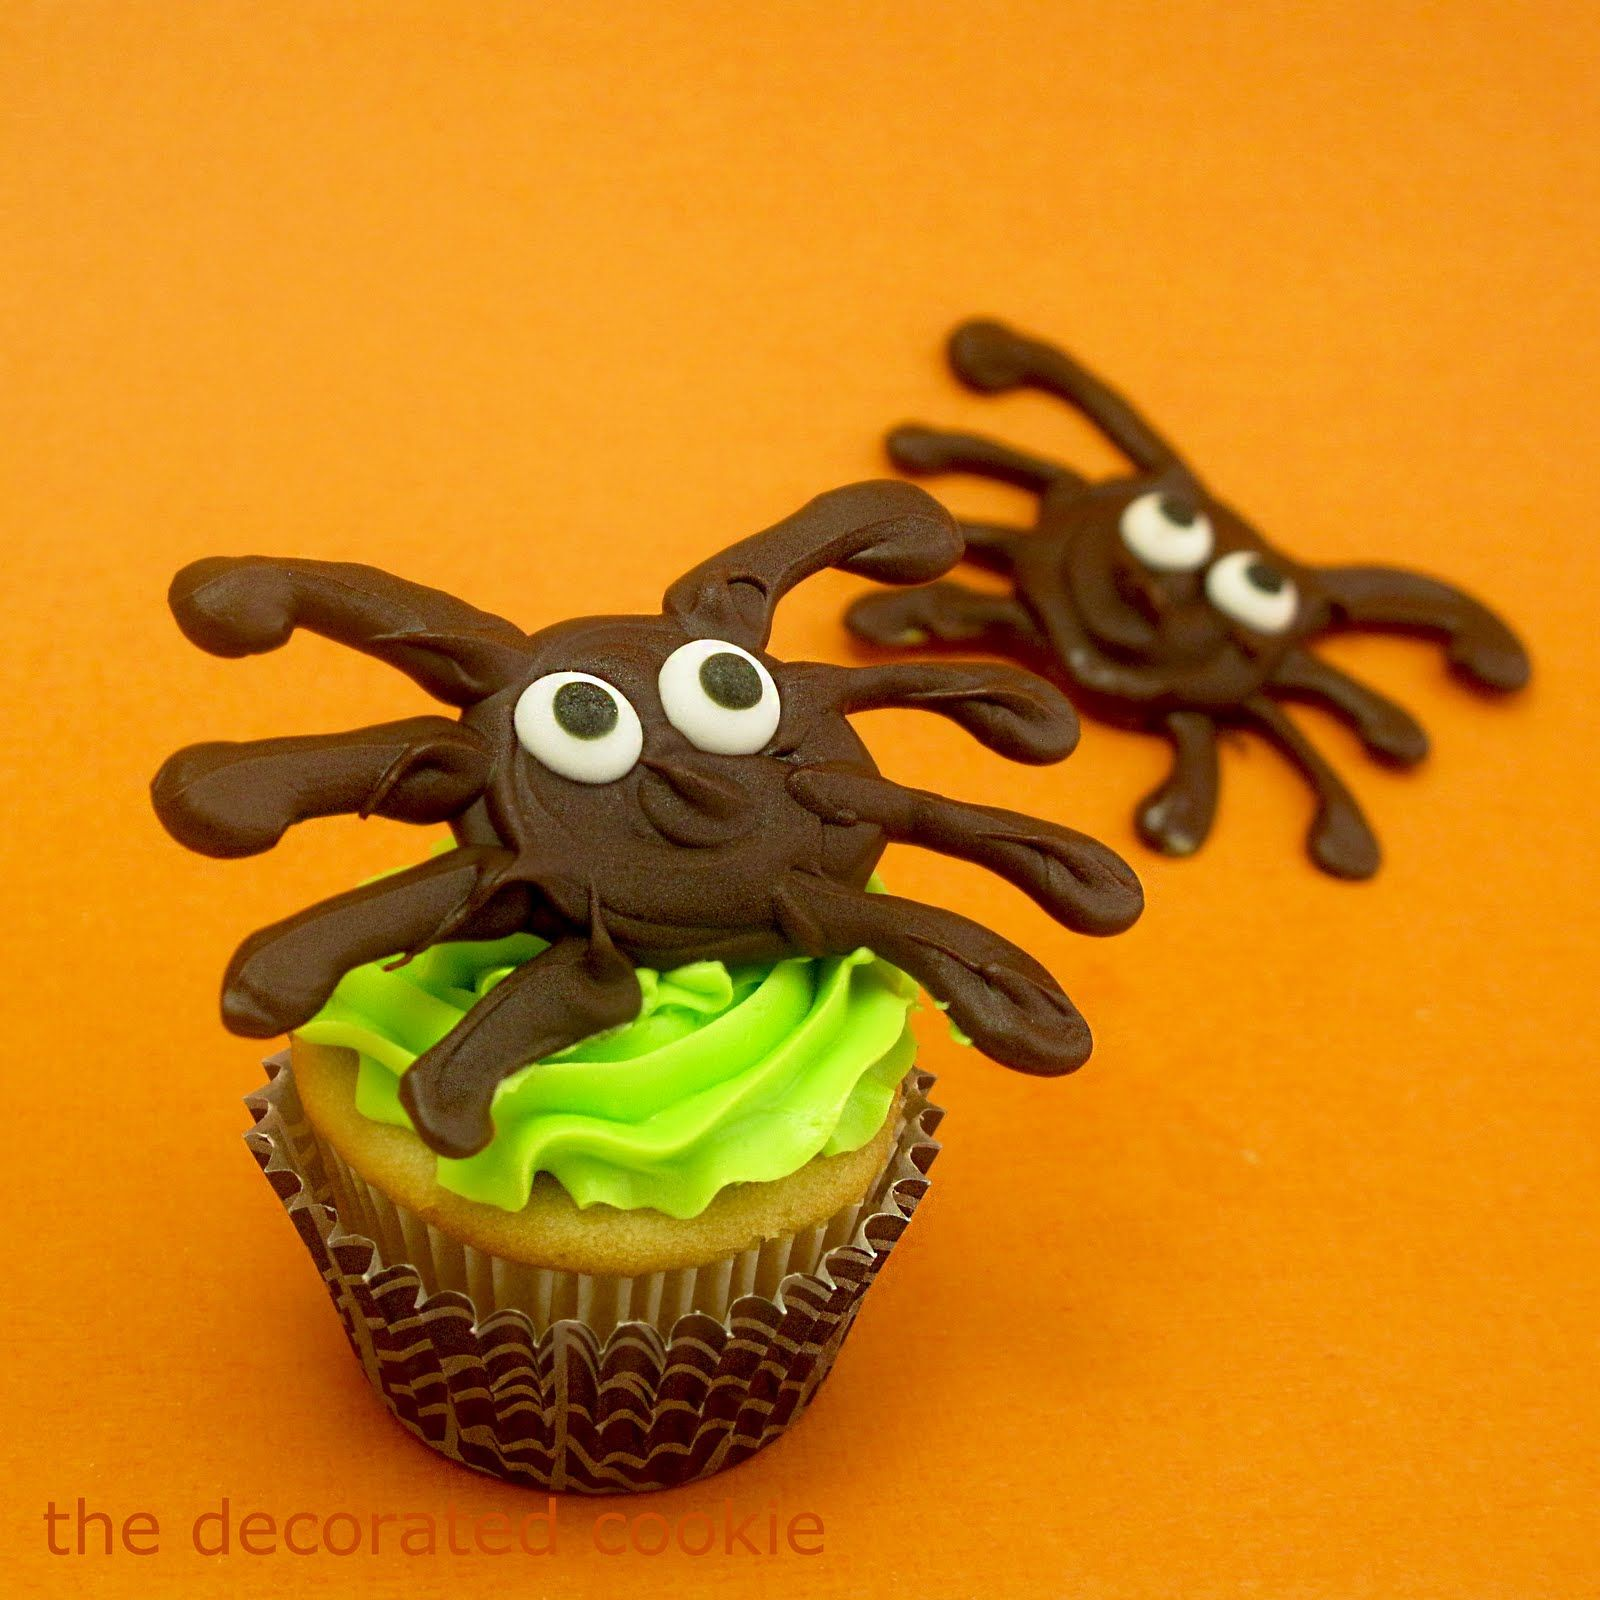 chocolate spider pops for halloween - Halloween Chocolate Spiders